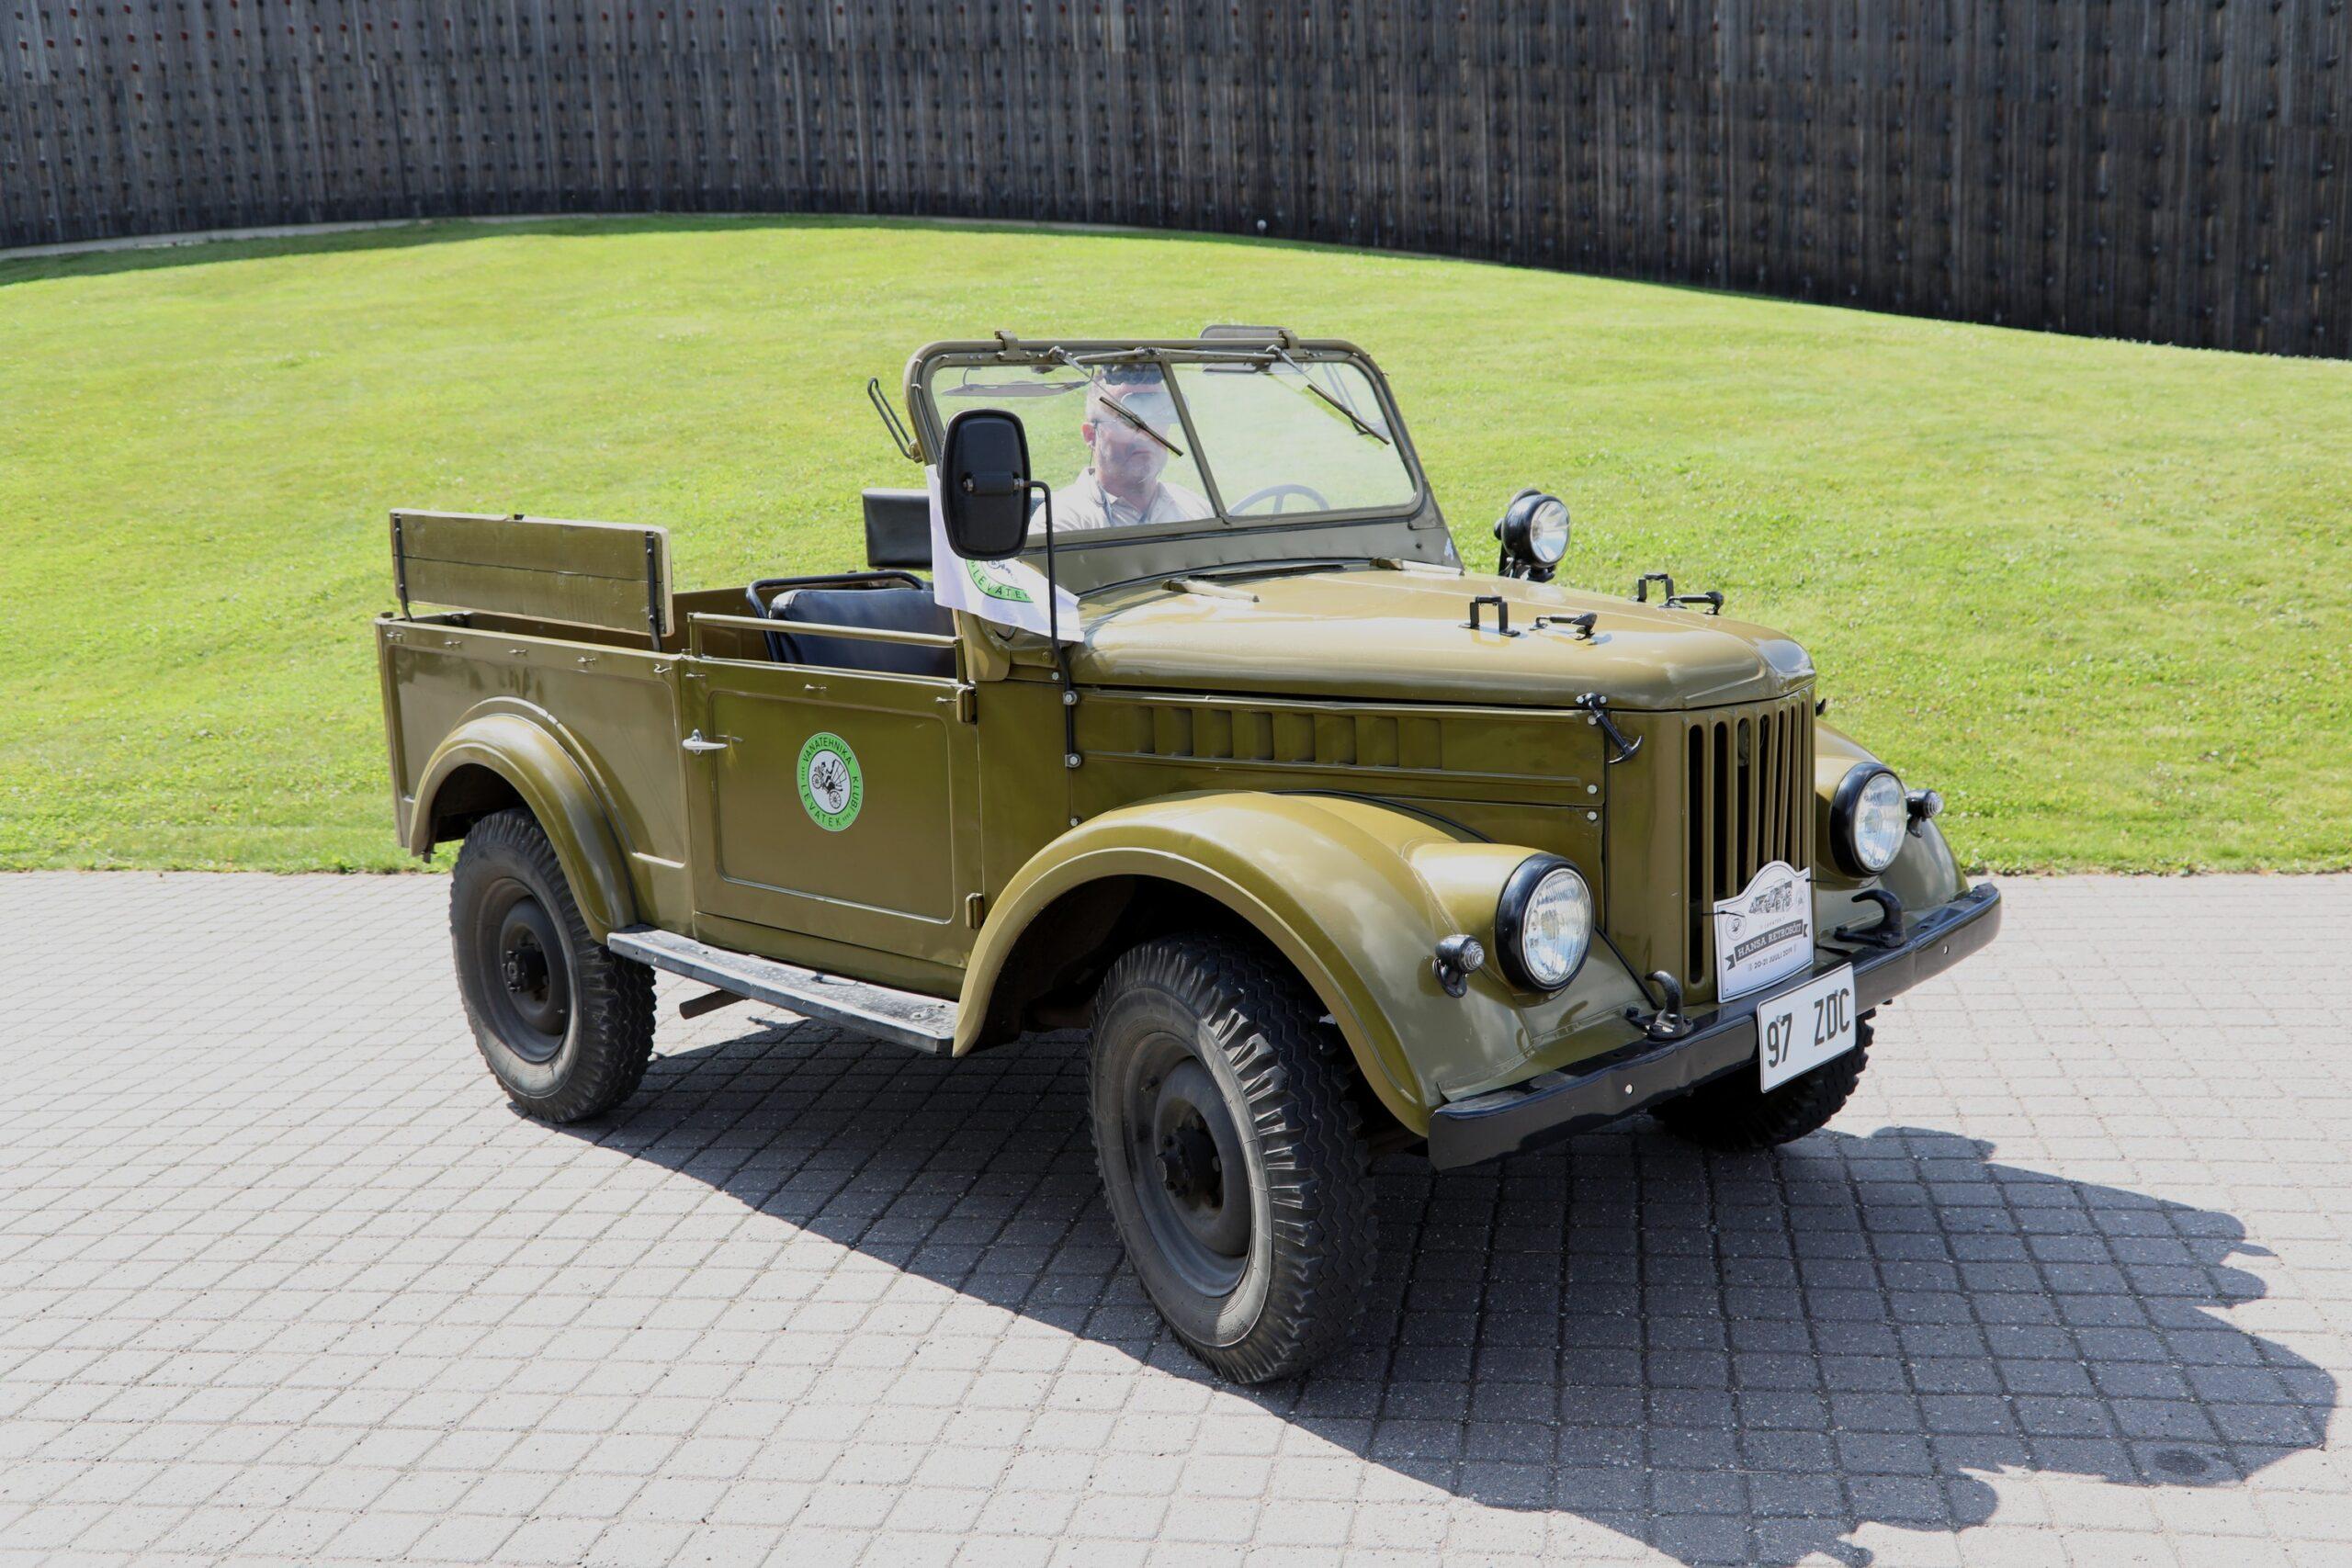 GAZ 69 oksjonilt